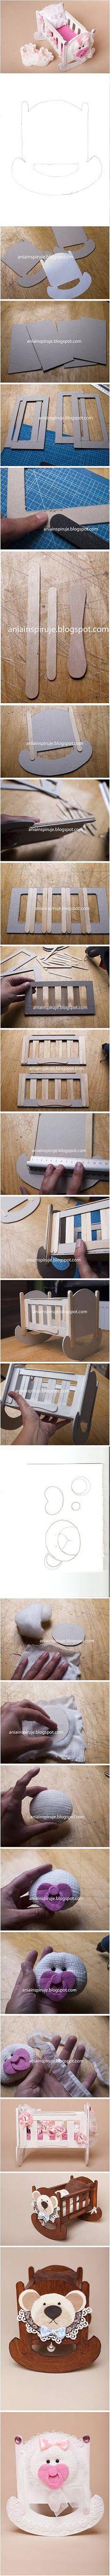 废物利用 手工 DIY Cardboard Baby Cradle